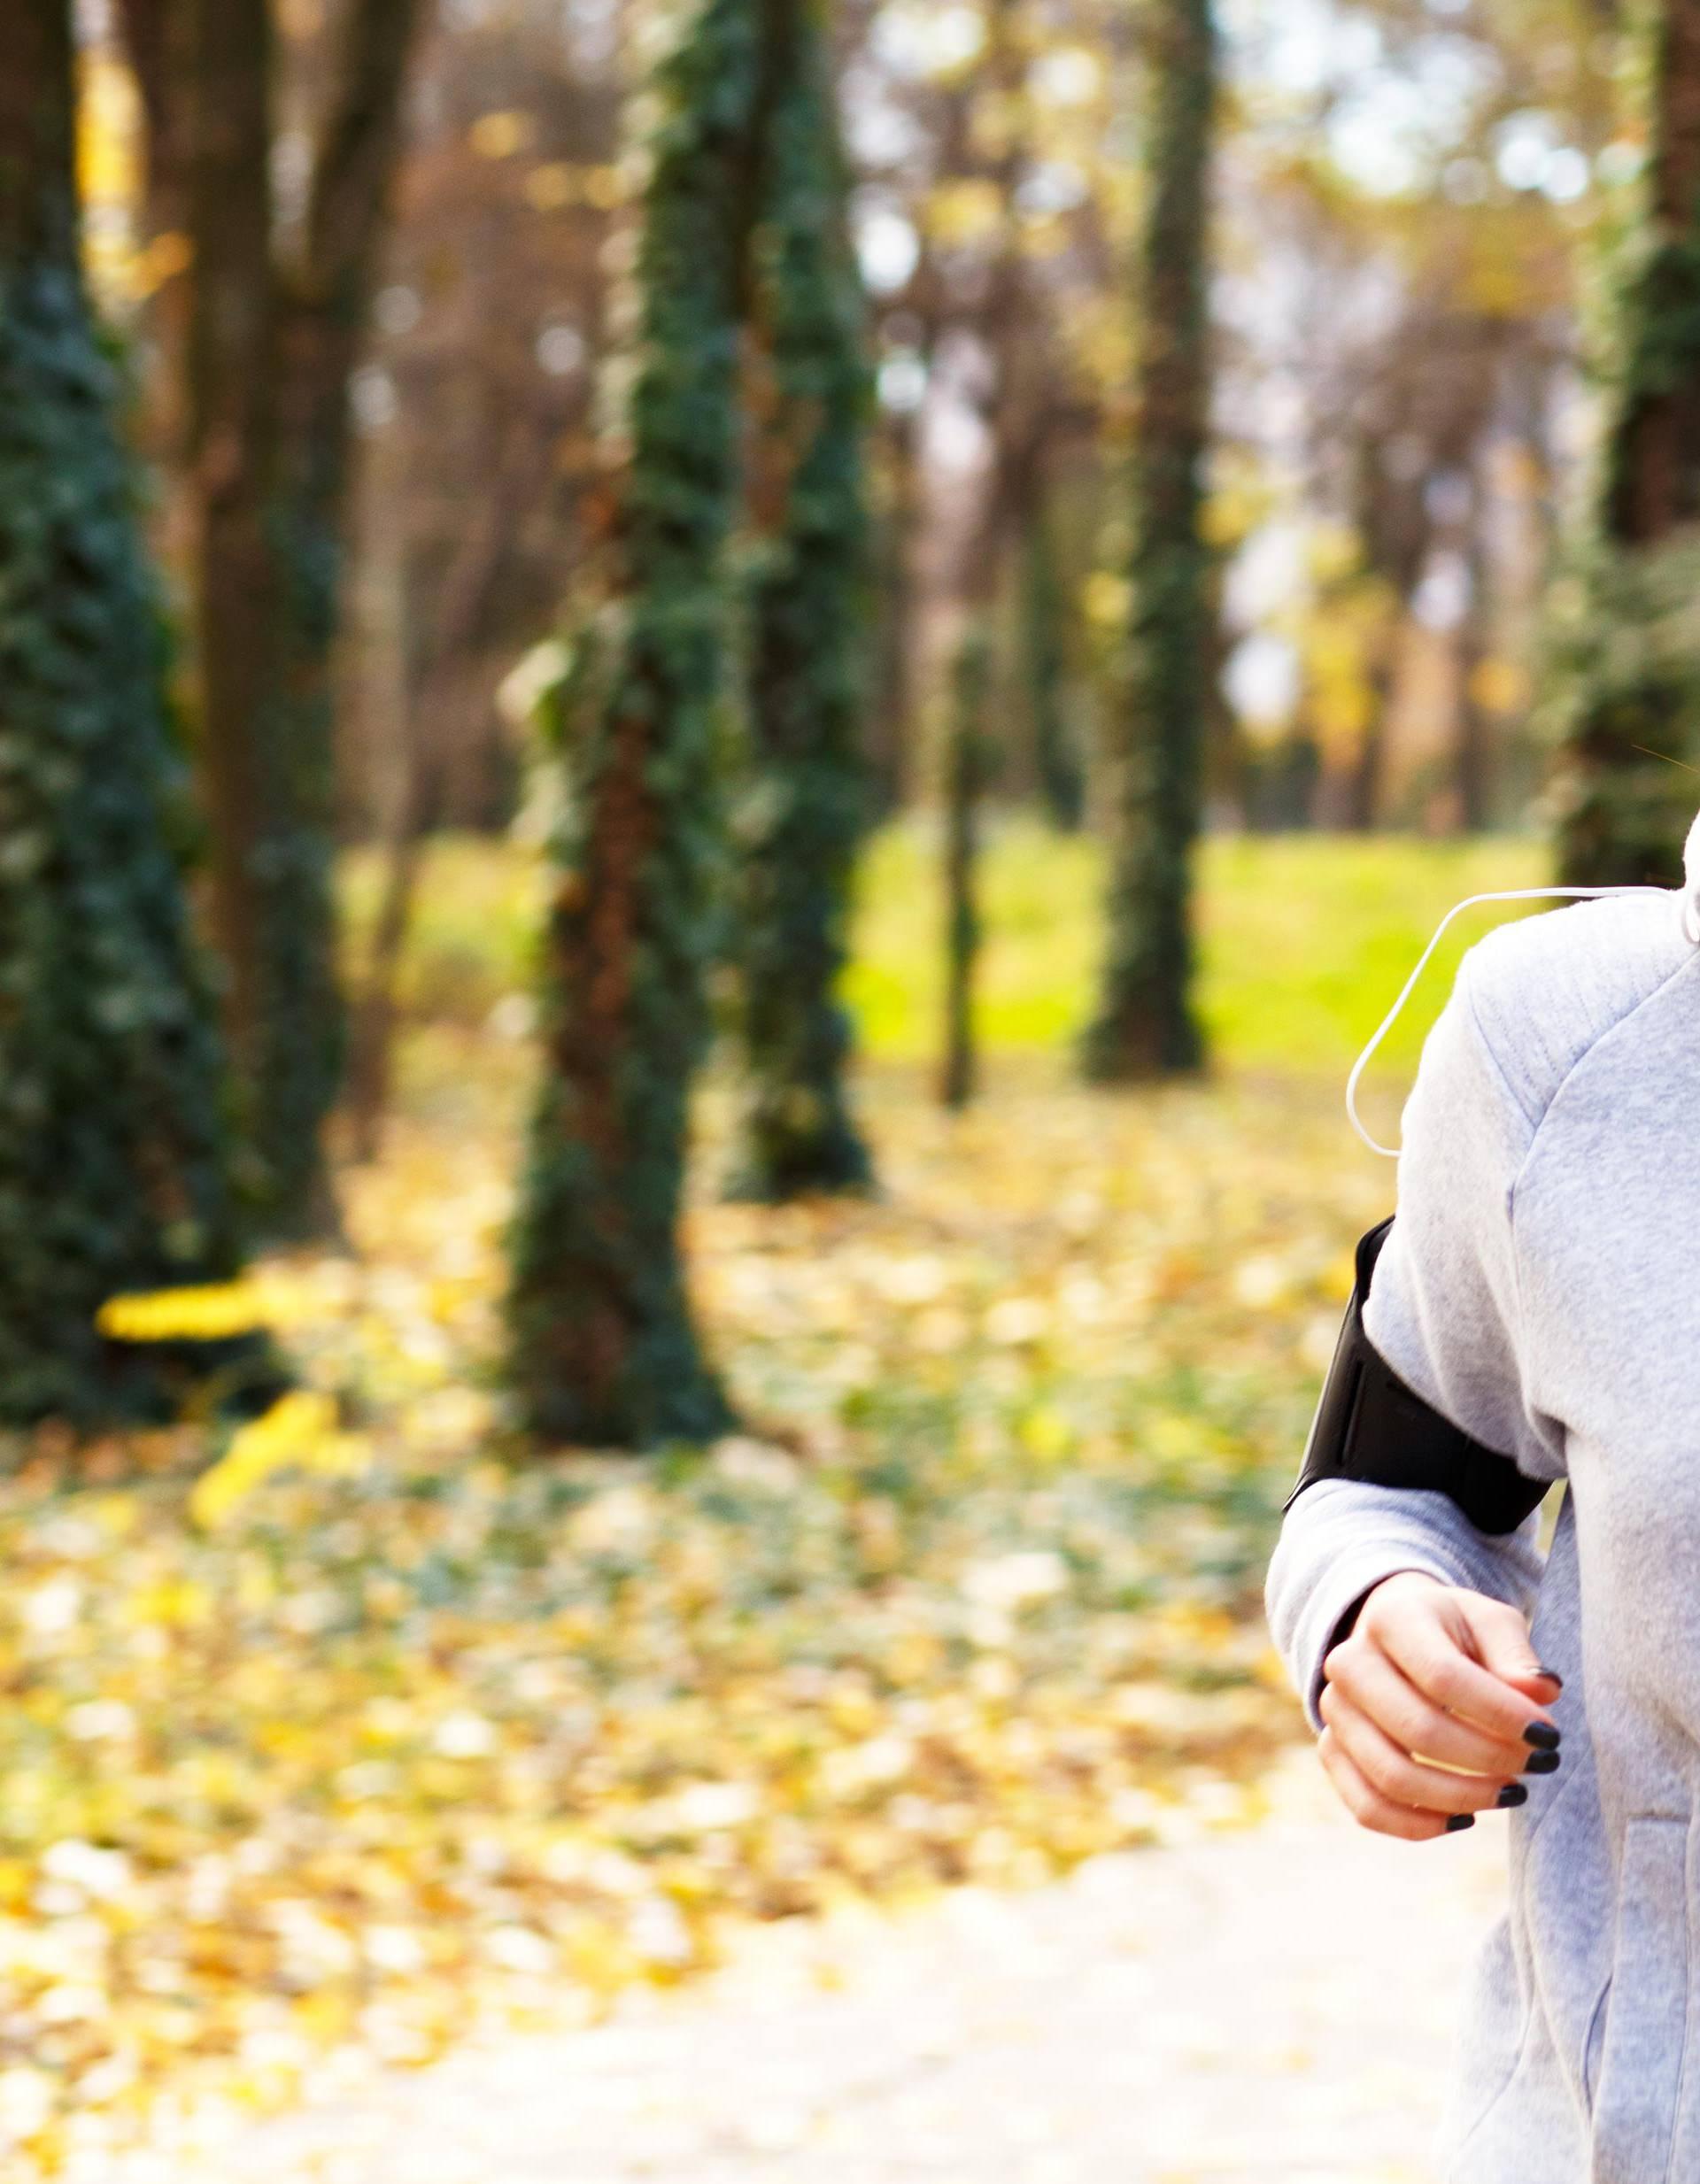 Fat burning zona: Gubitak kila ovisi o tempu kojim trenirate